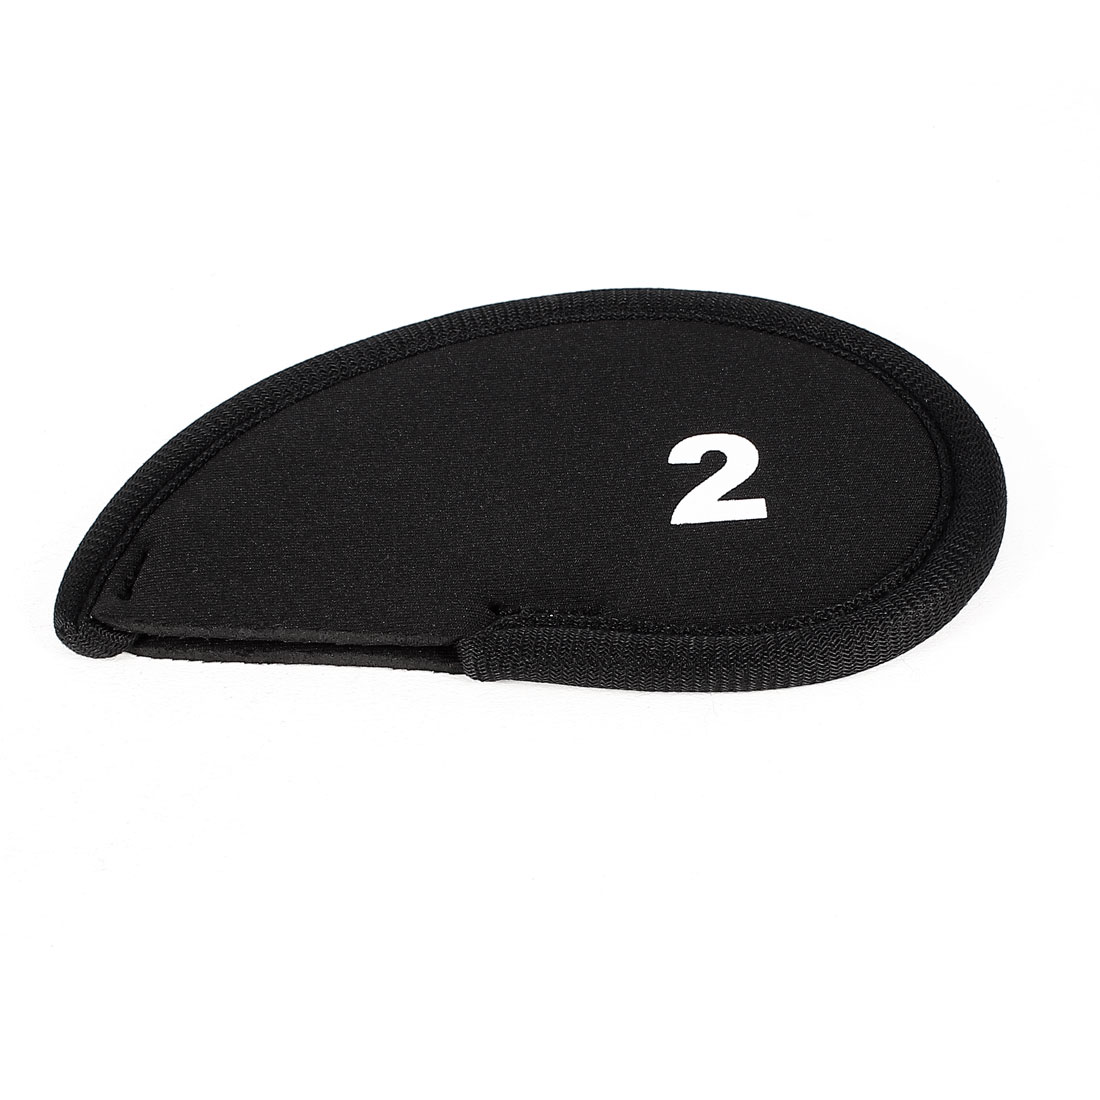 Neoprene Golf Club Head Cover 2 Wedge Iron Protective Headcovers Black